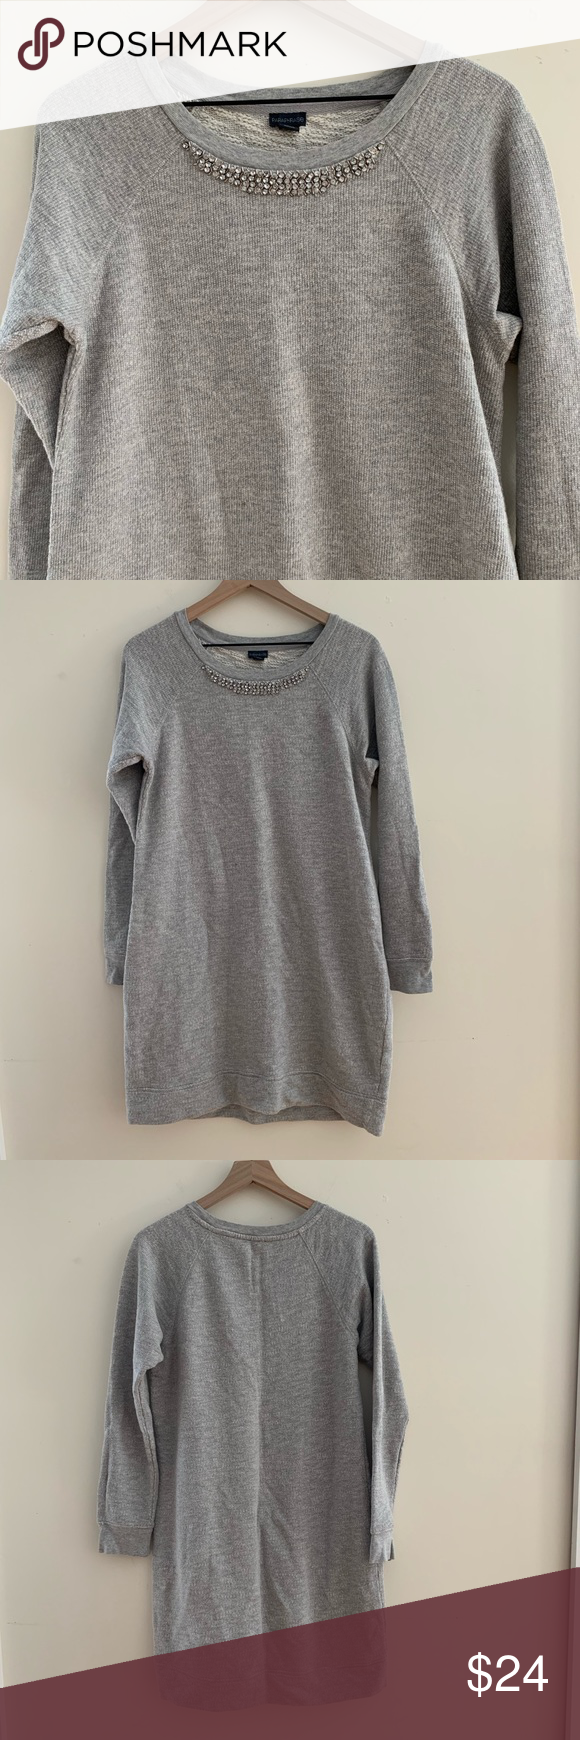 Paraphrase Sweatshirt Dres With Necklace Detail Heather Grey Never Worn Dresses Dress